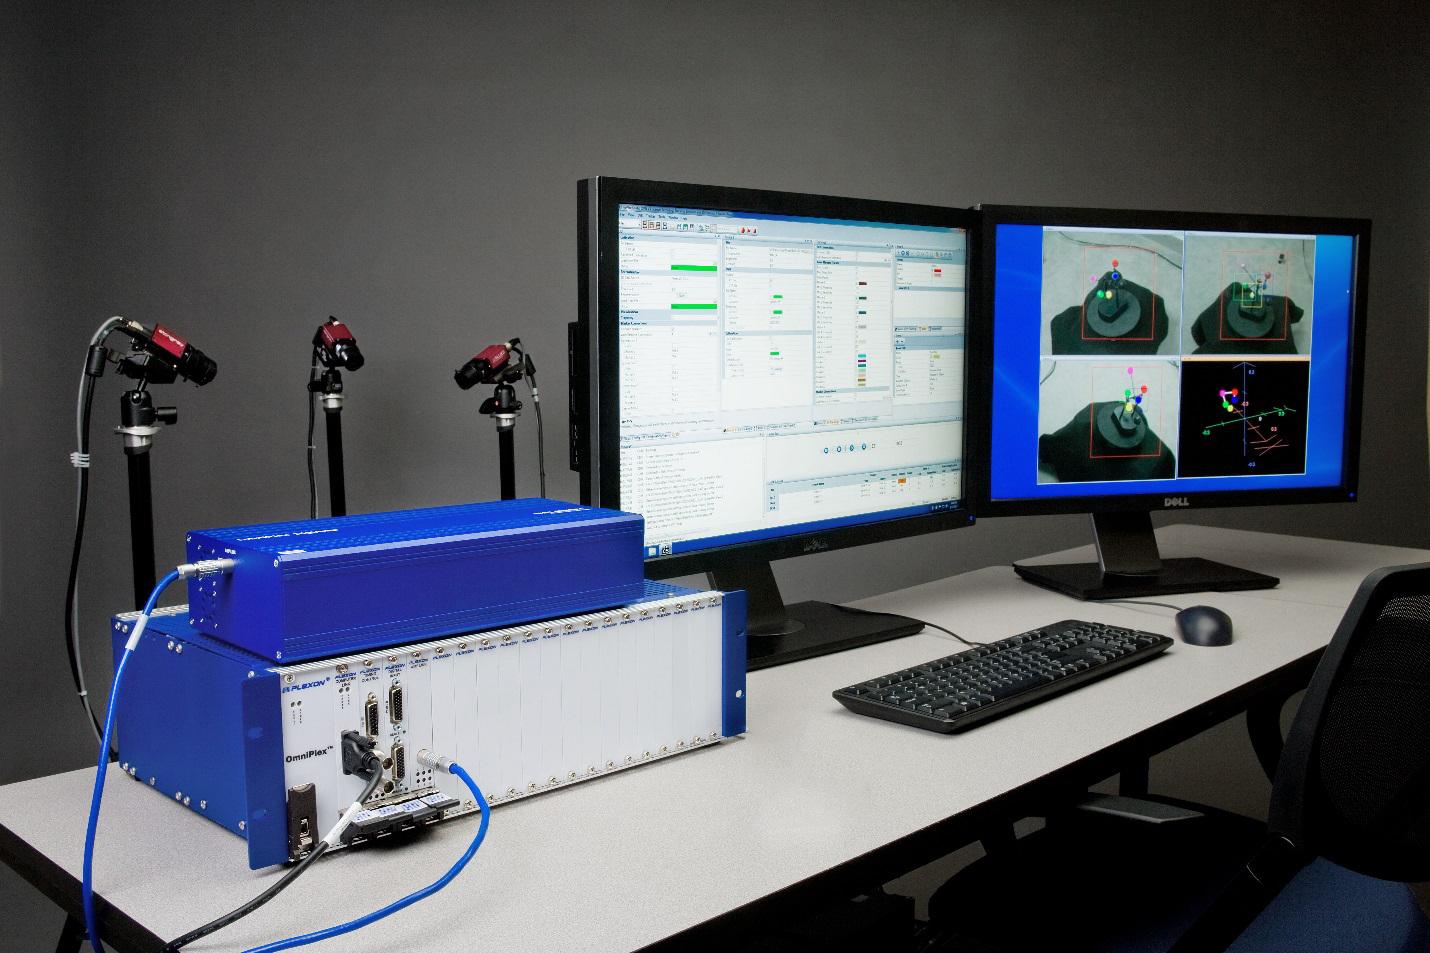 cineplex video tracking software